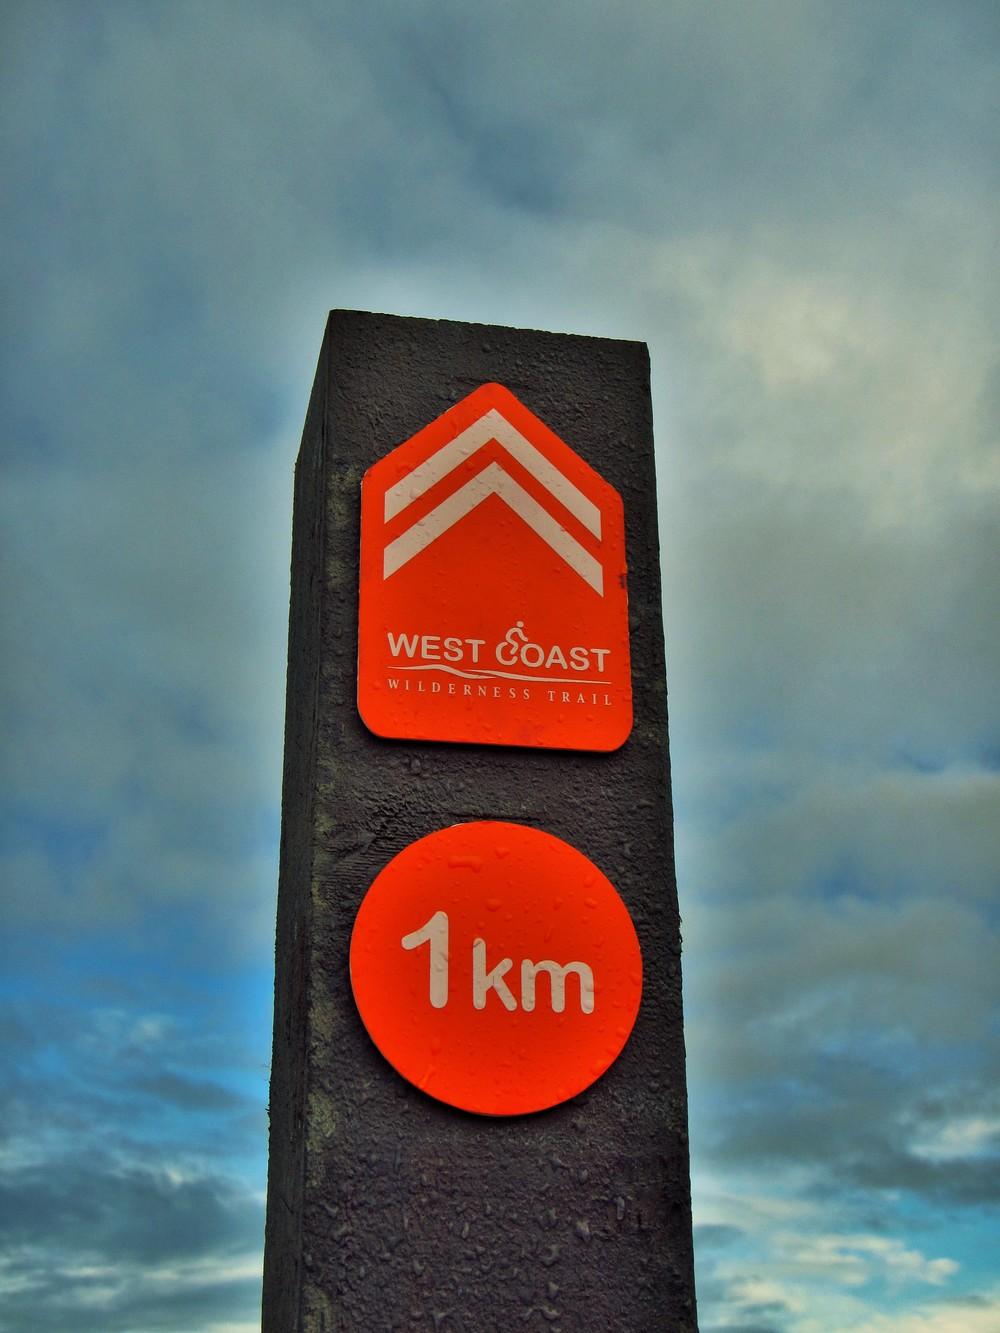 A friendly site. West Coast Wilderness Trail.